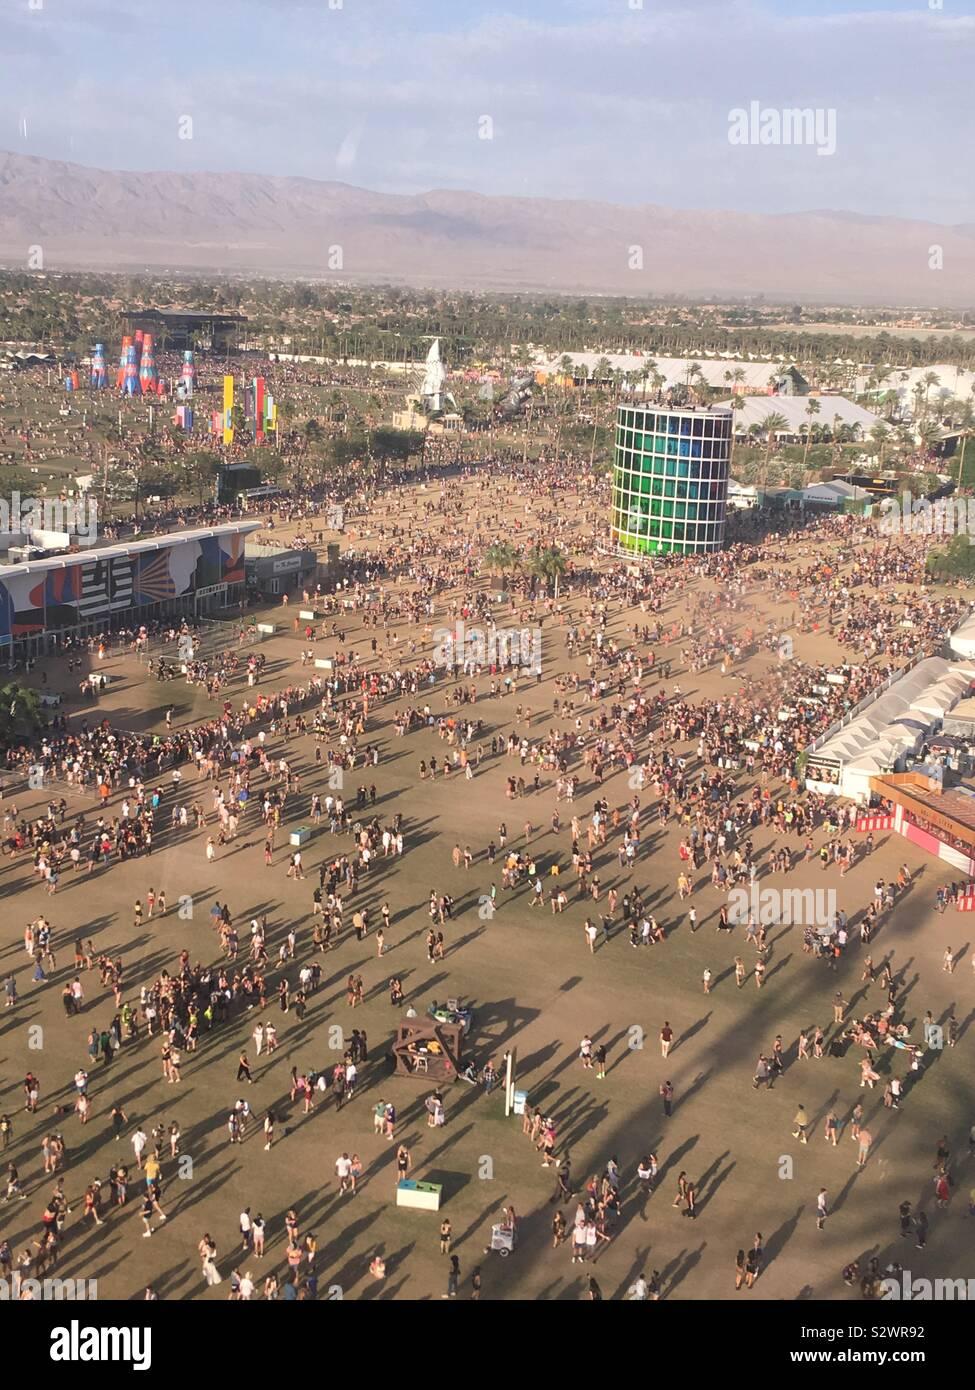 Coachella Music Festival Stock Photos & Coachella Music